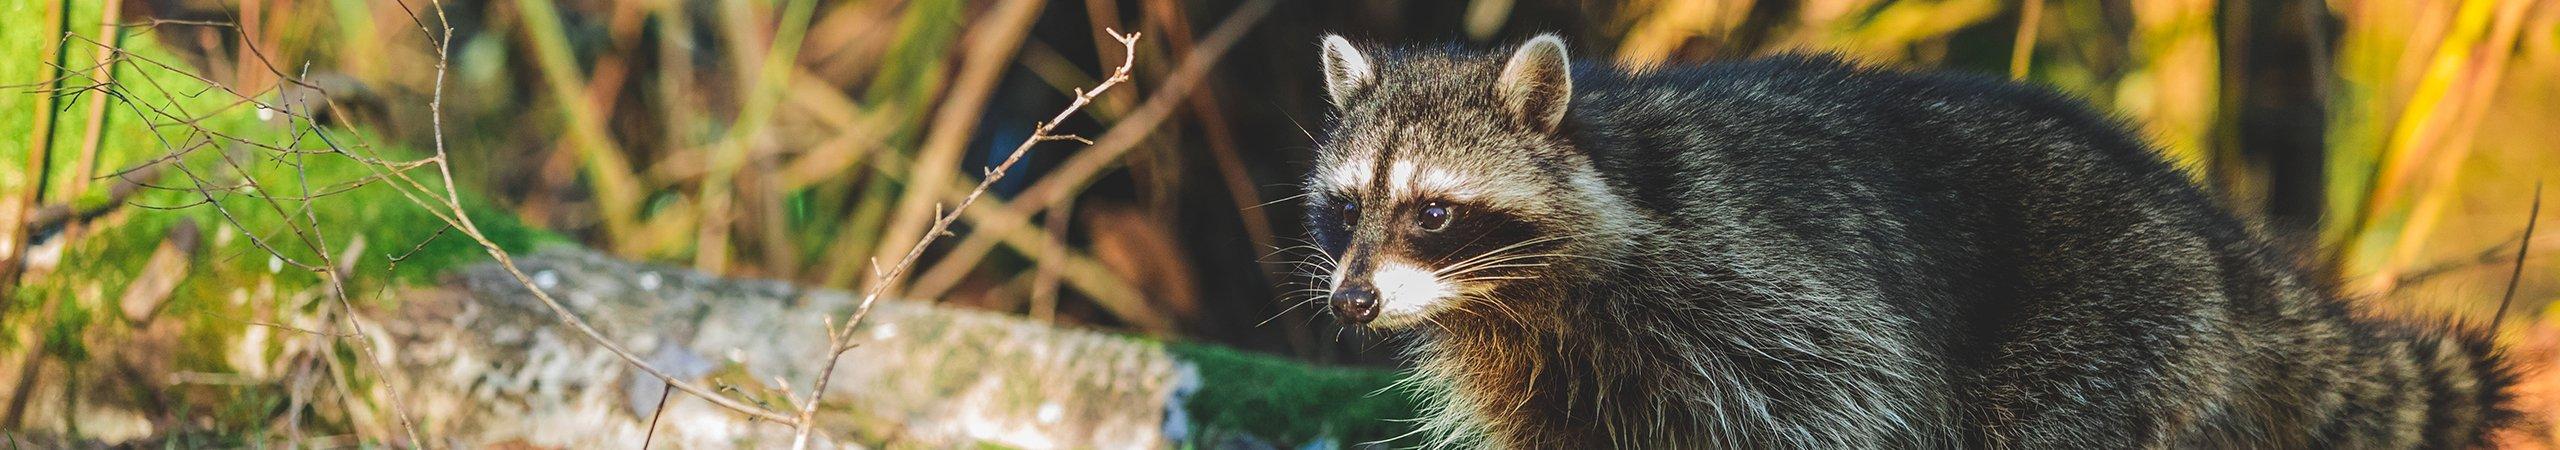 a raccoon up close